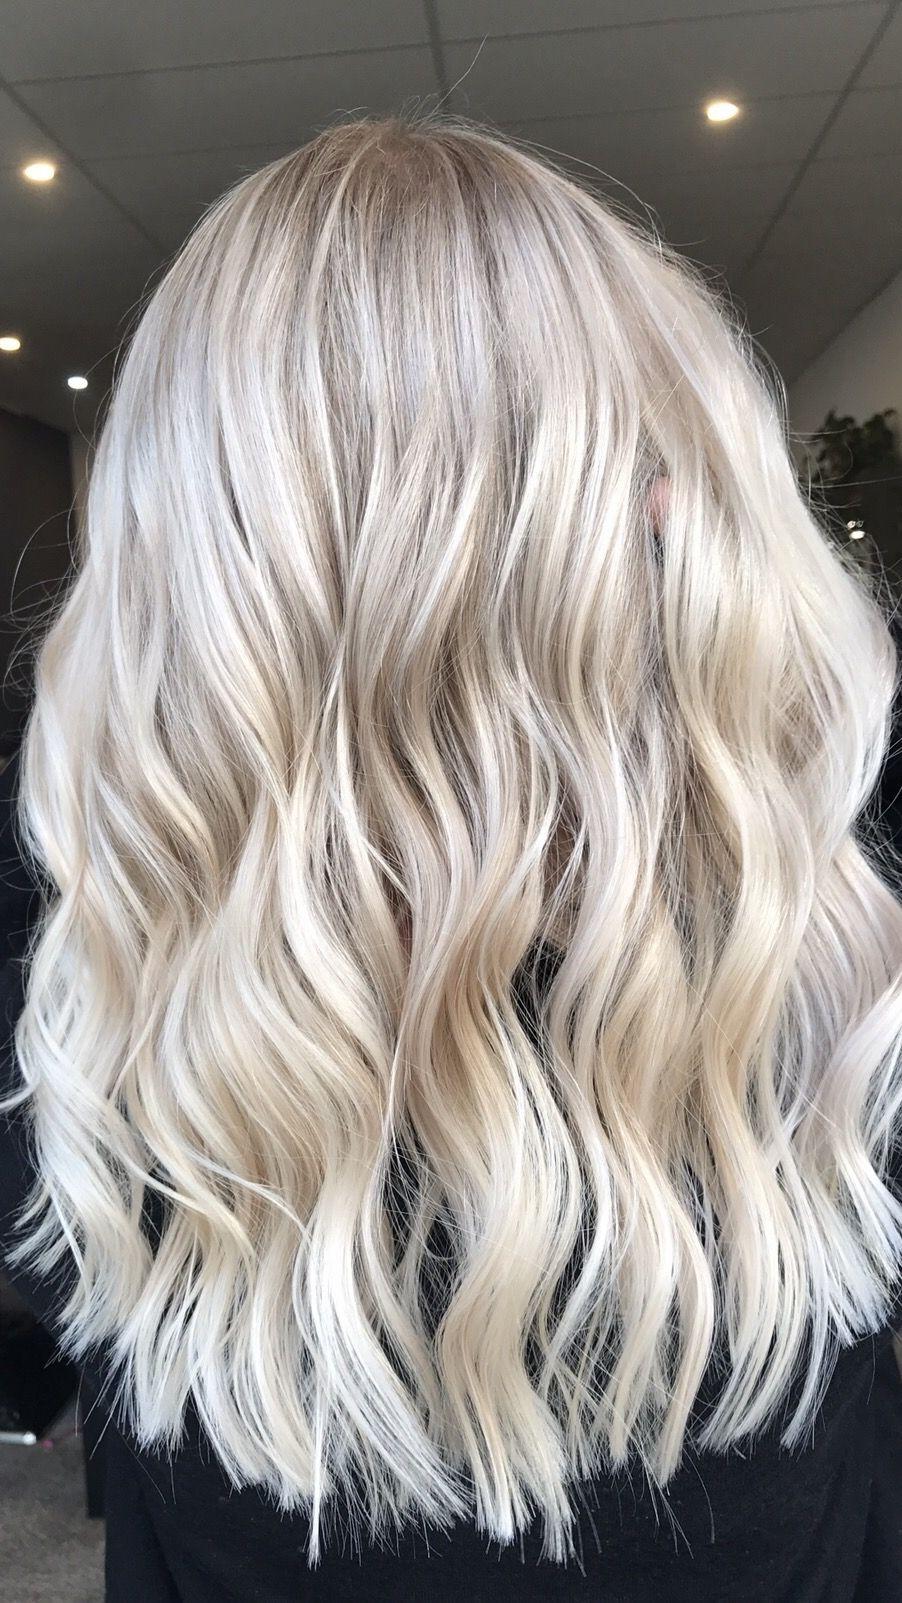 Hair Inspiration Instagram Hairbykaitlinjade Blonde Balayage Long Hair Cool Girl Hair Lived In Hair Colour As Blond Haar Blonde Highlights Blond Haar